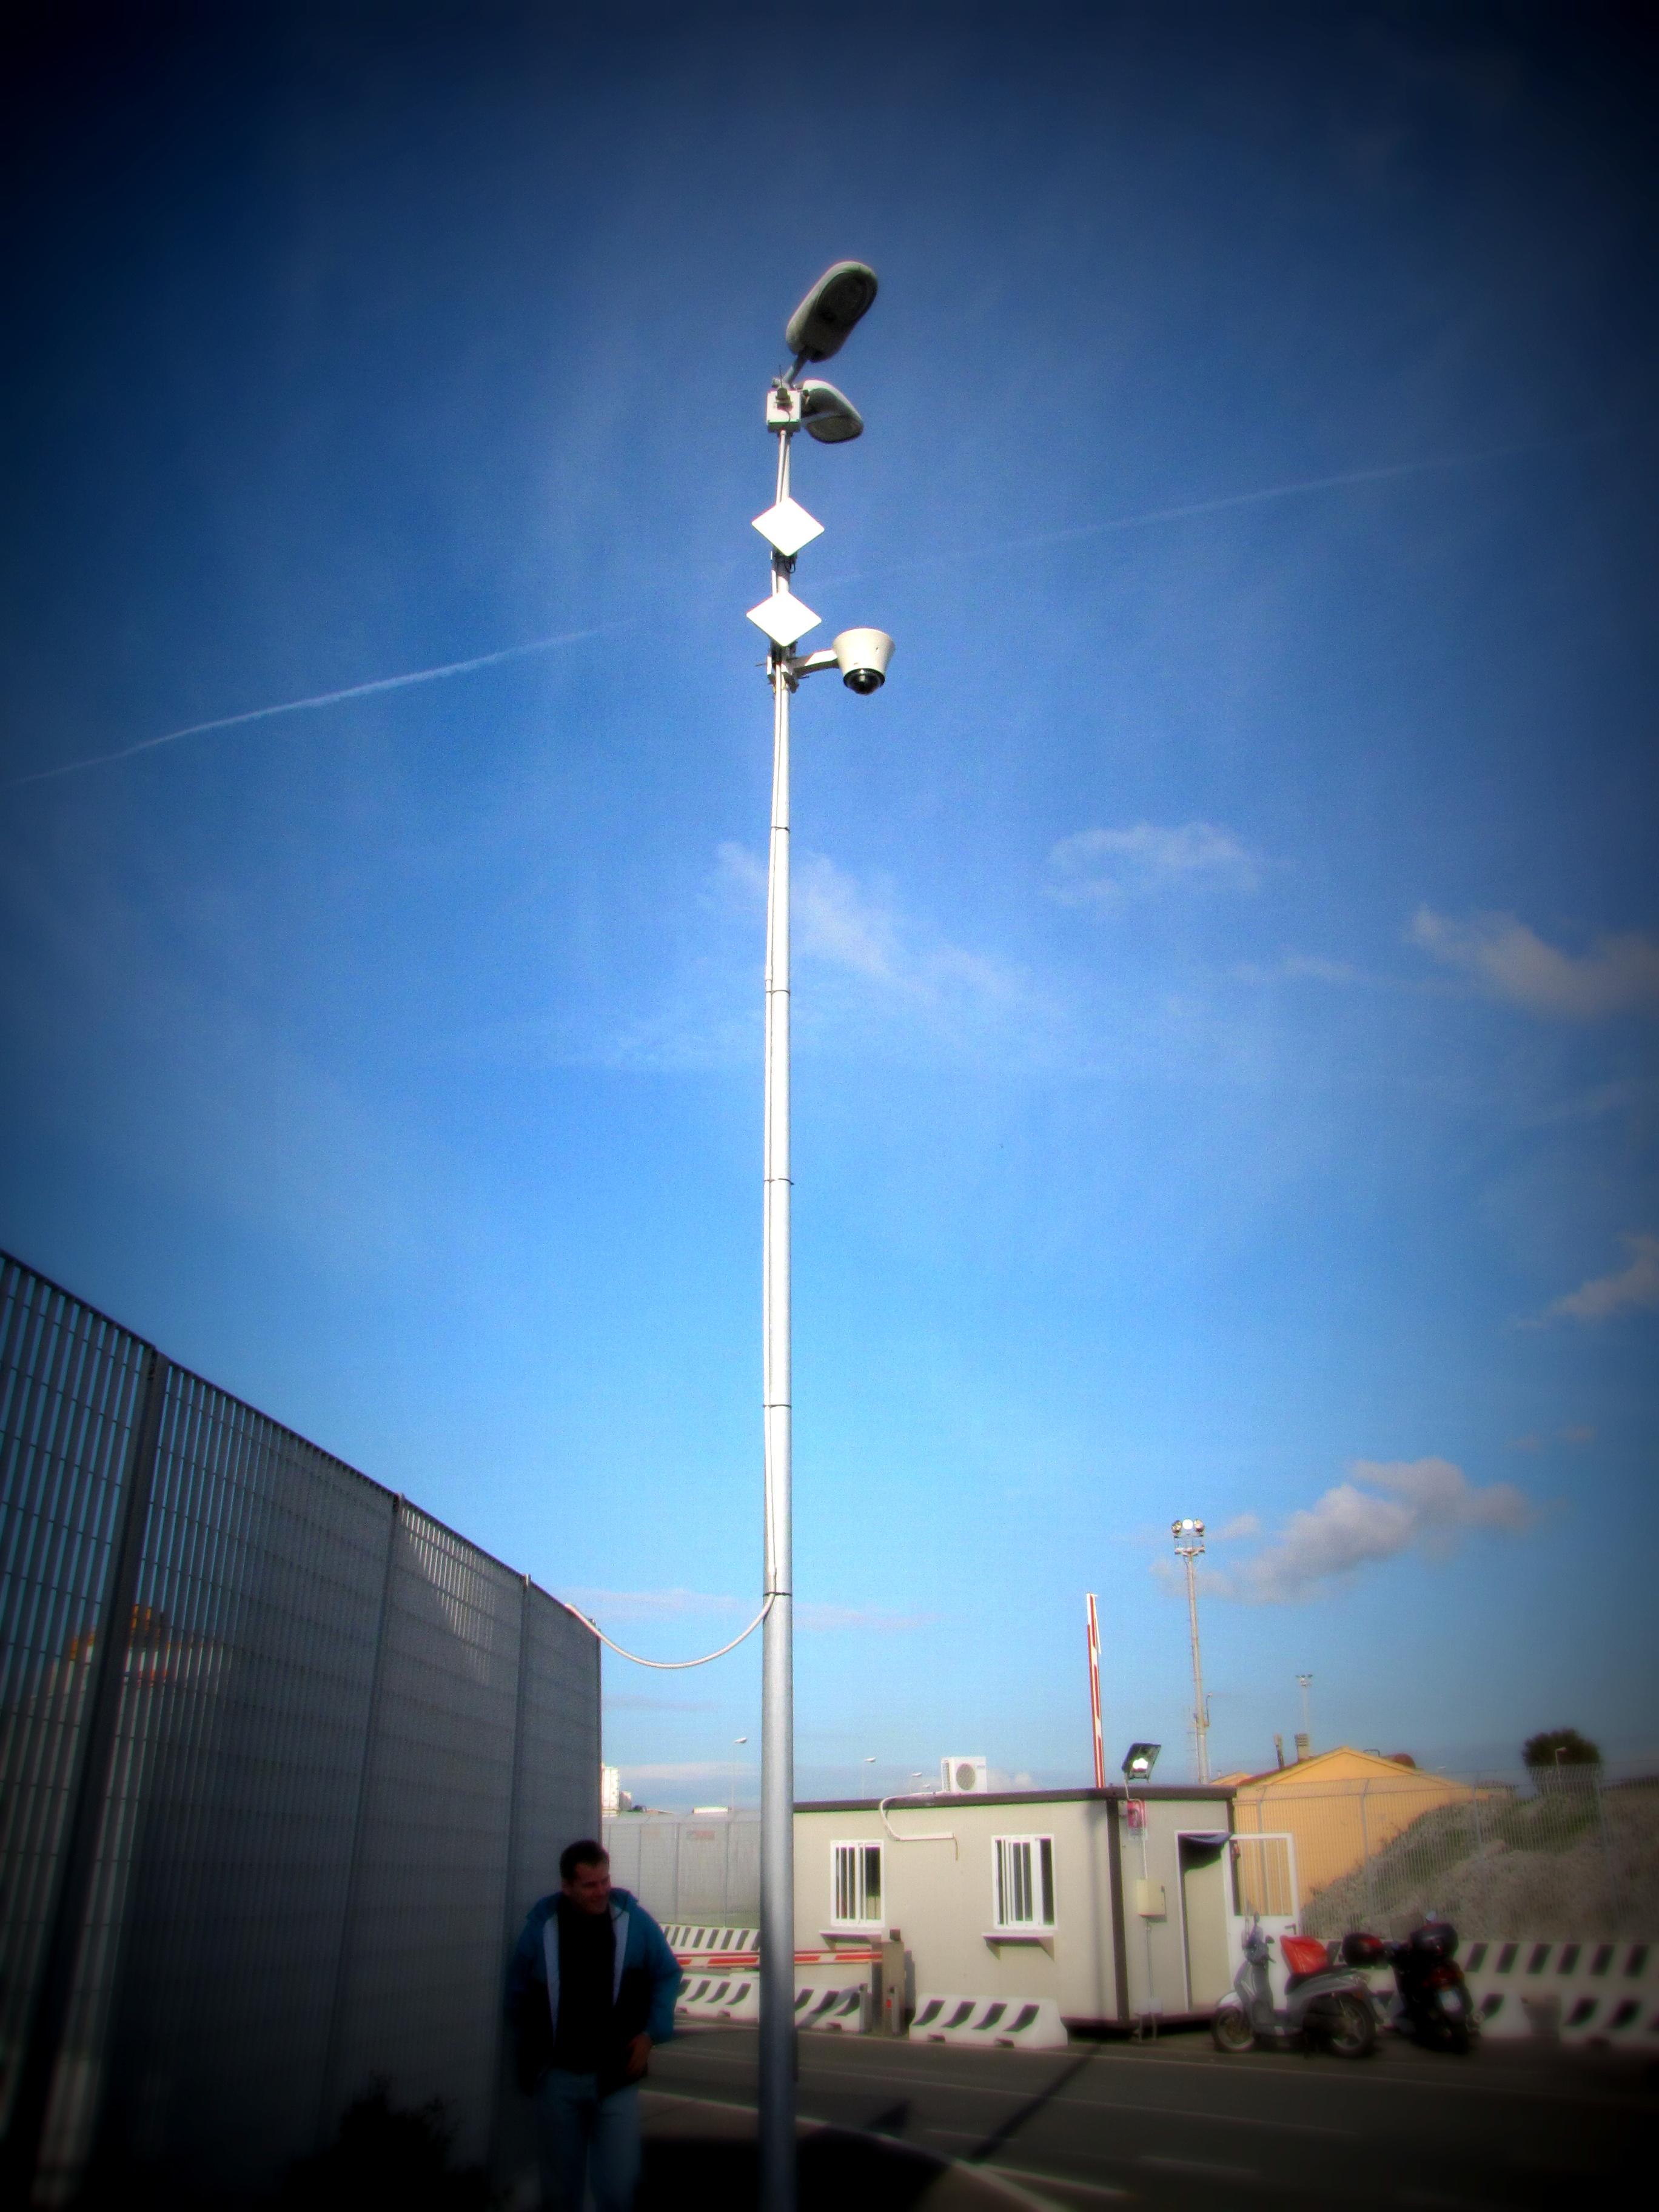 Video vigilancia inalámbrica en Municipalidades   Blog de ...